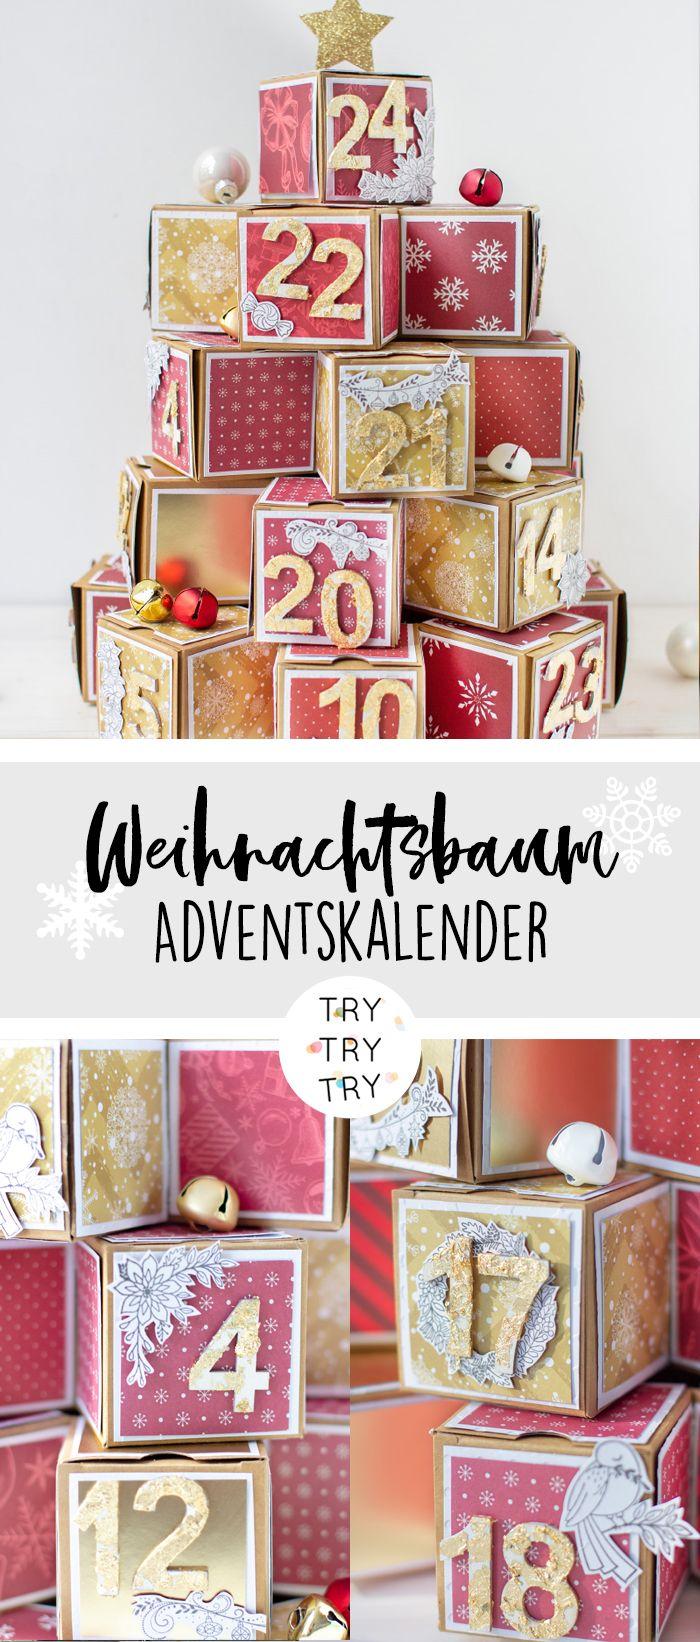 weihnachtsbaum adventskalender adventskalender. Black Bedroom Furniture Sets. Home Design Ideas